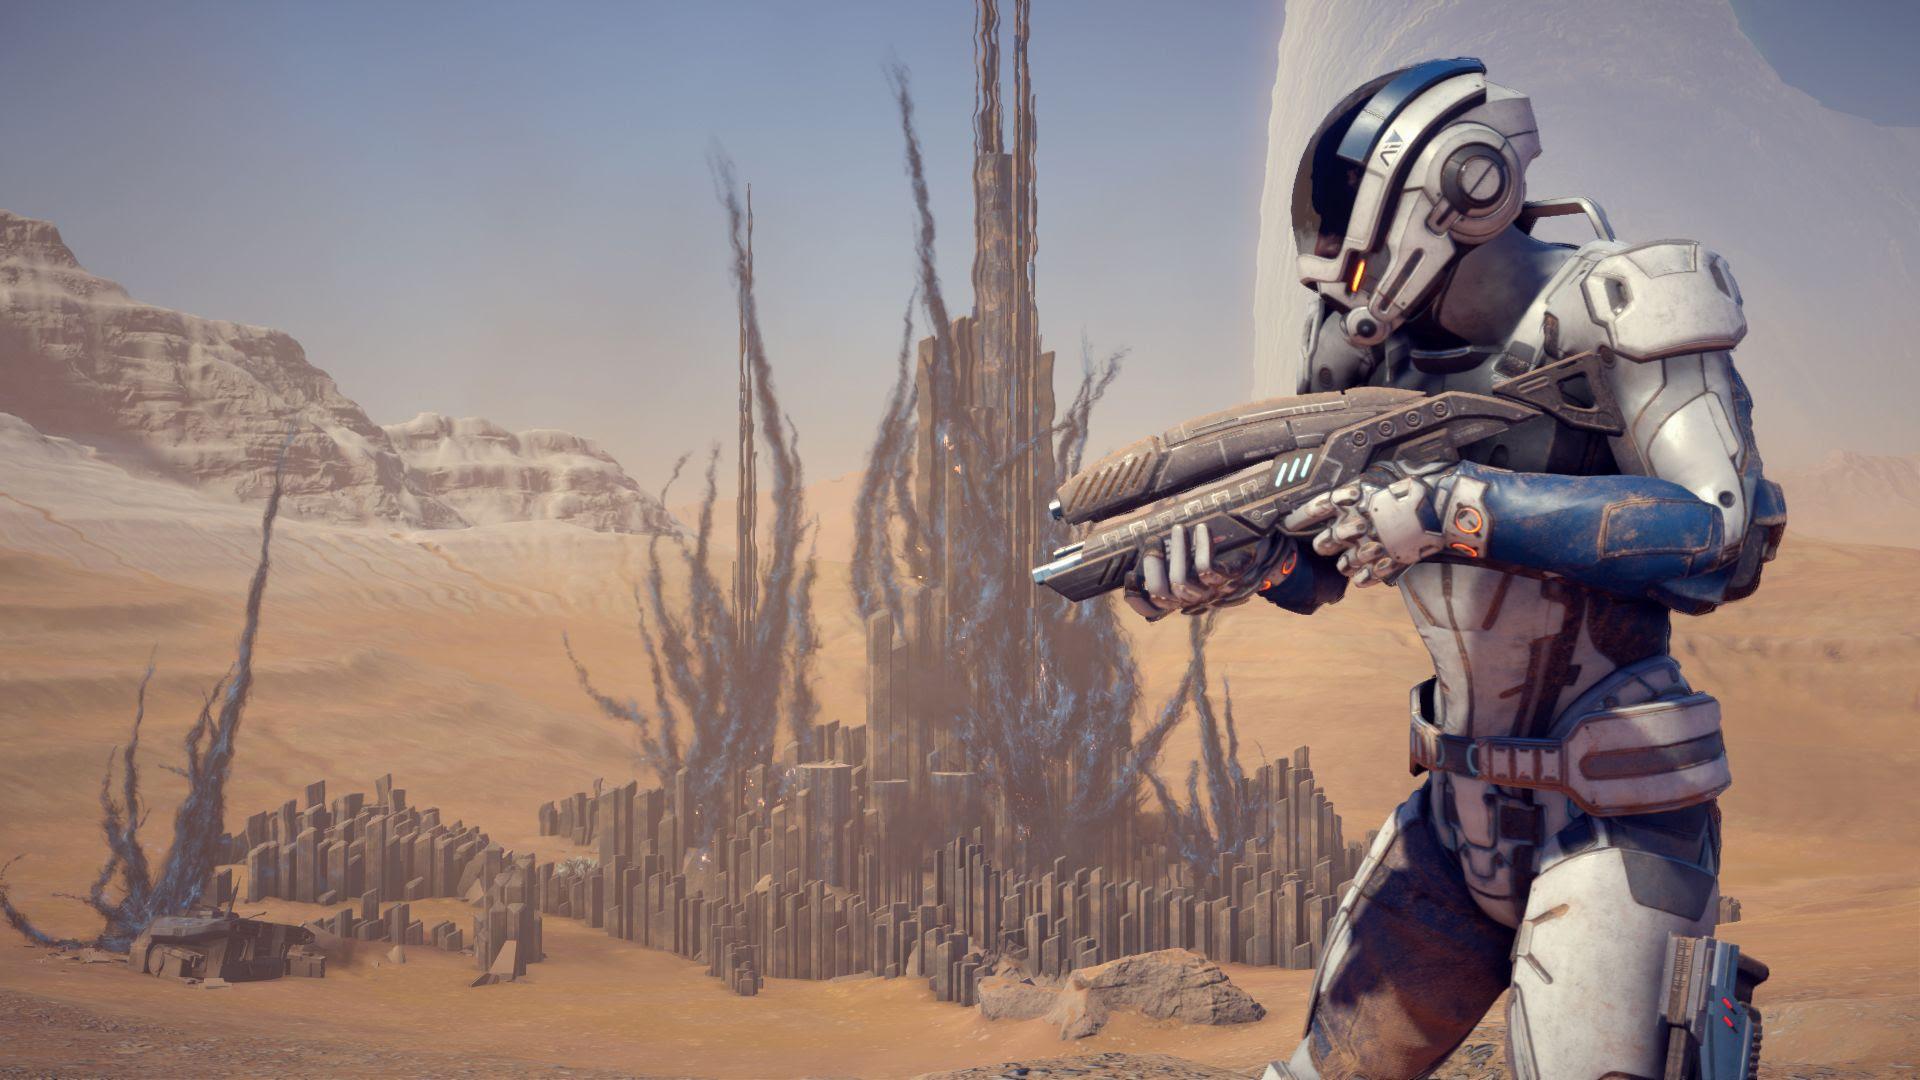 Mass Effect: Andromeda now has a 10 hour trial screenshot